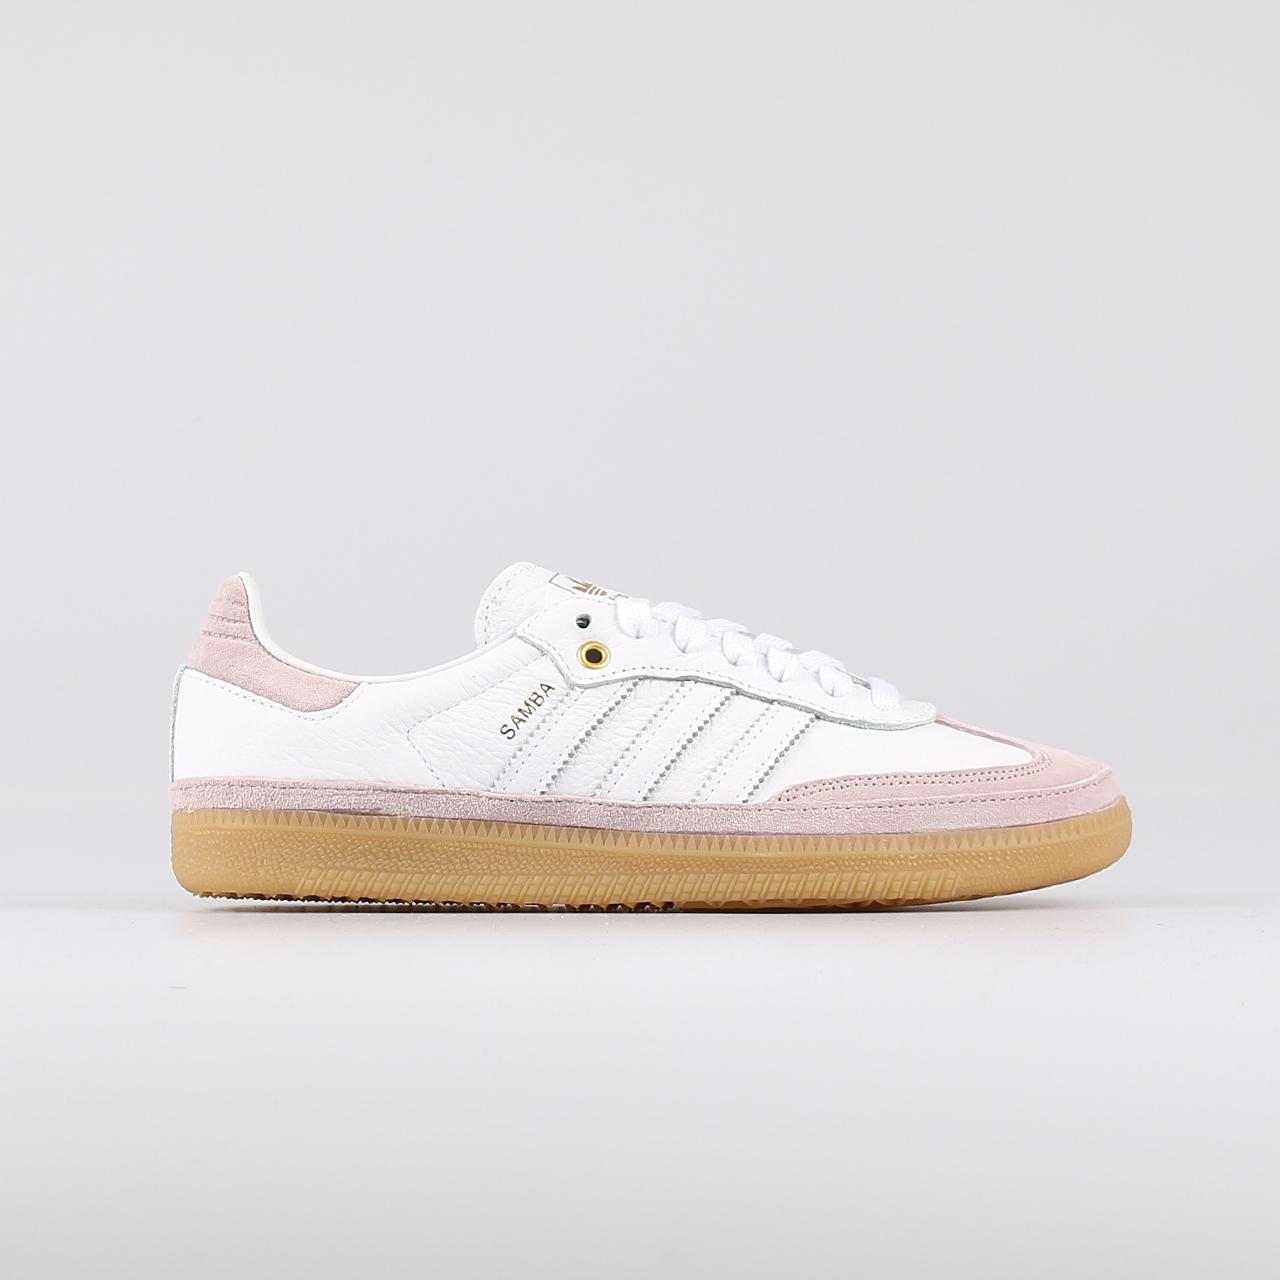 adidas samba og w relay sneakers dames wit_35150.jpg